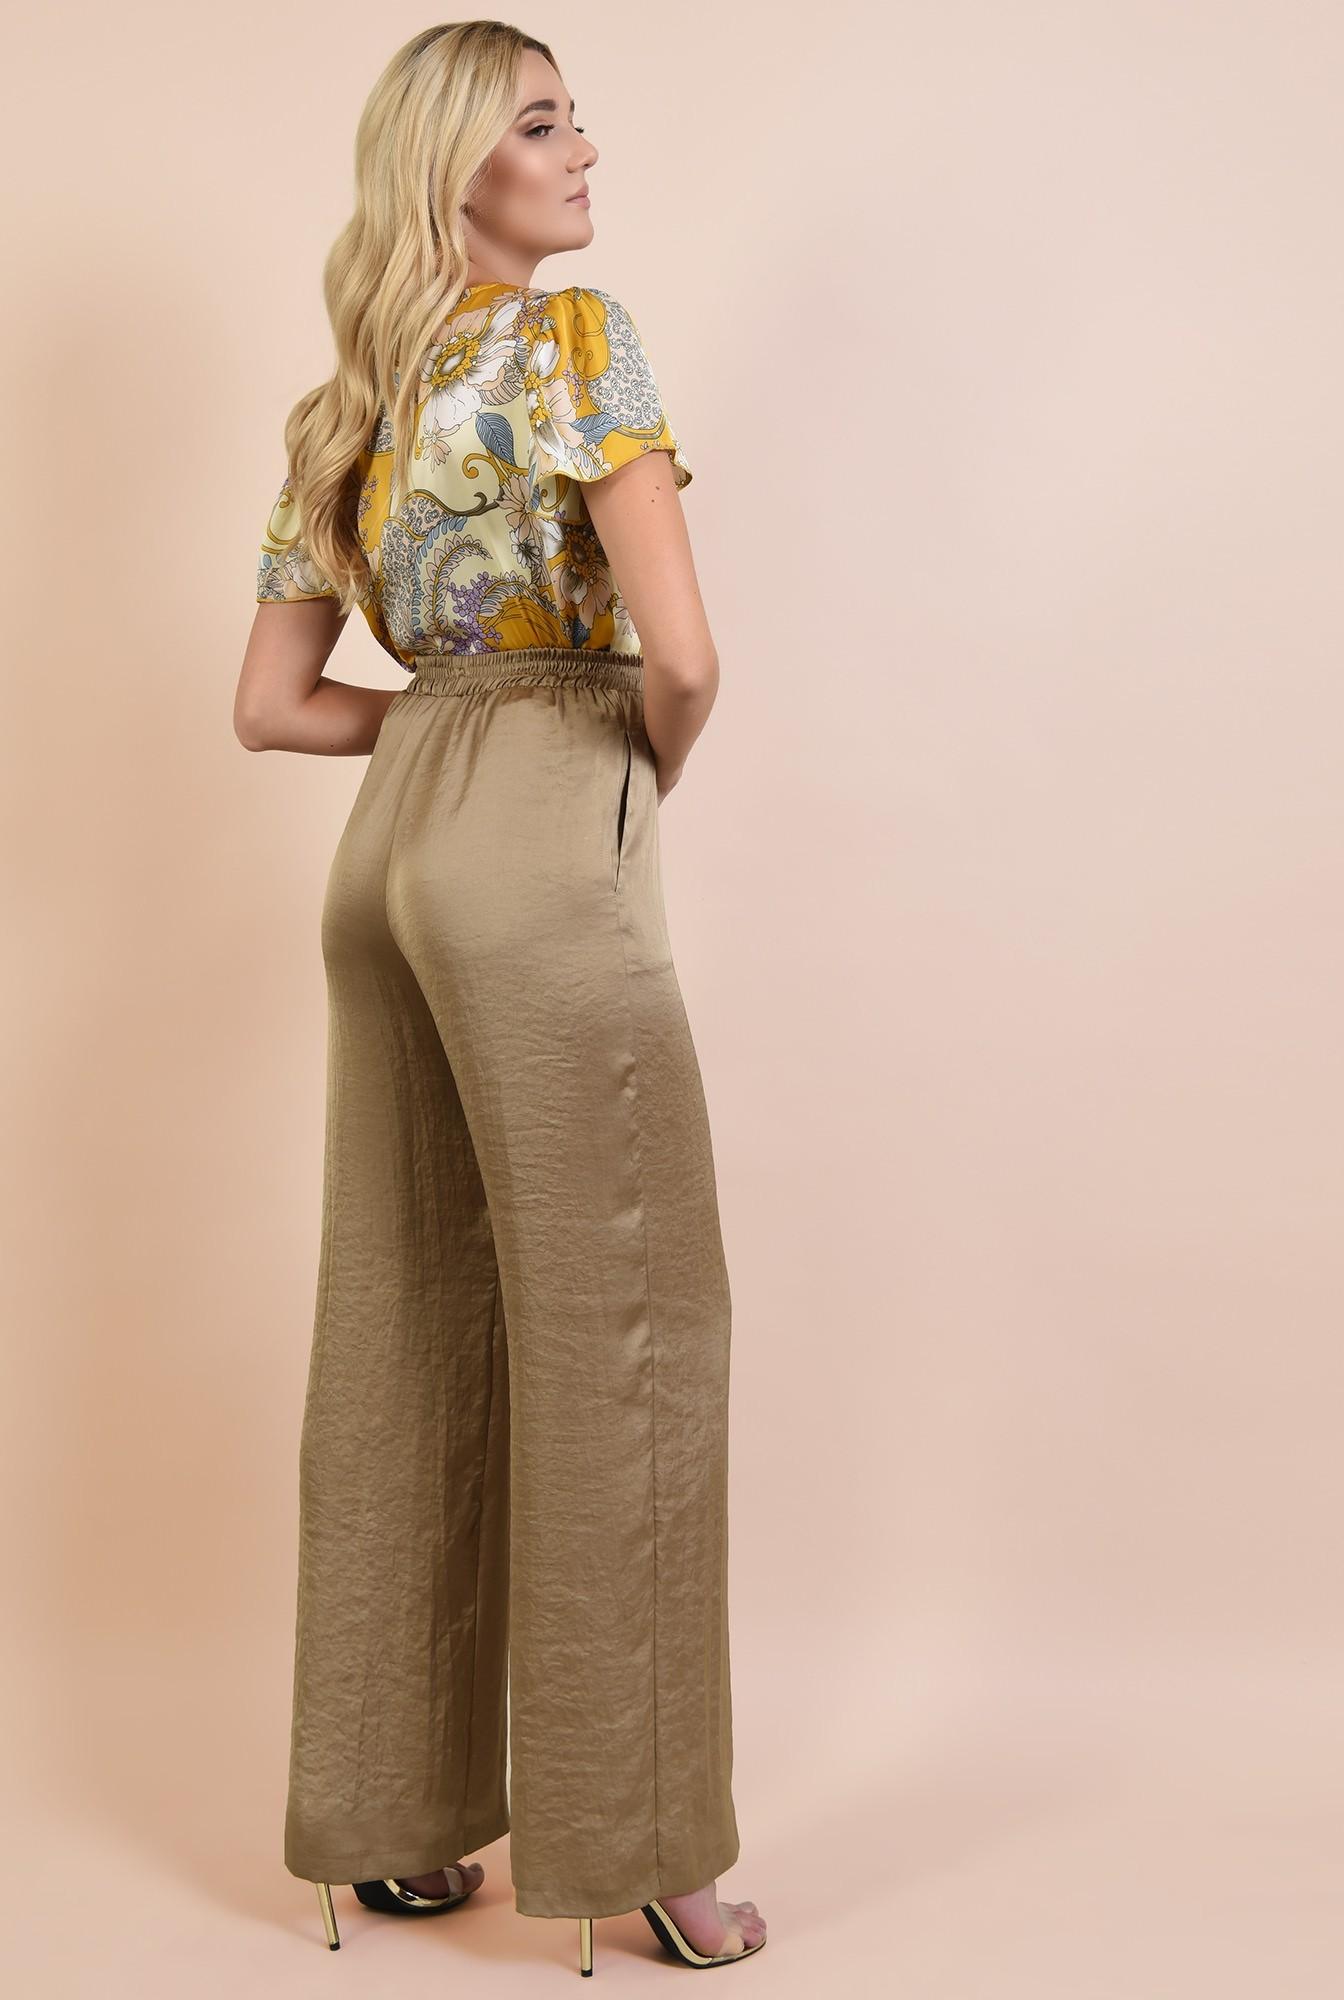 1 - bluza eleganta, din satin, cu imprimeu floral, croi lejer parte peste parte